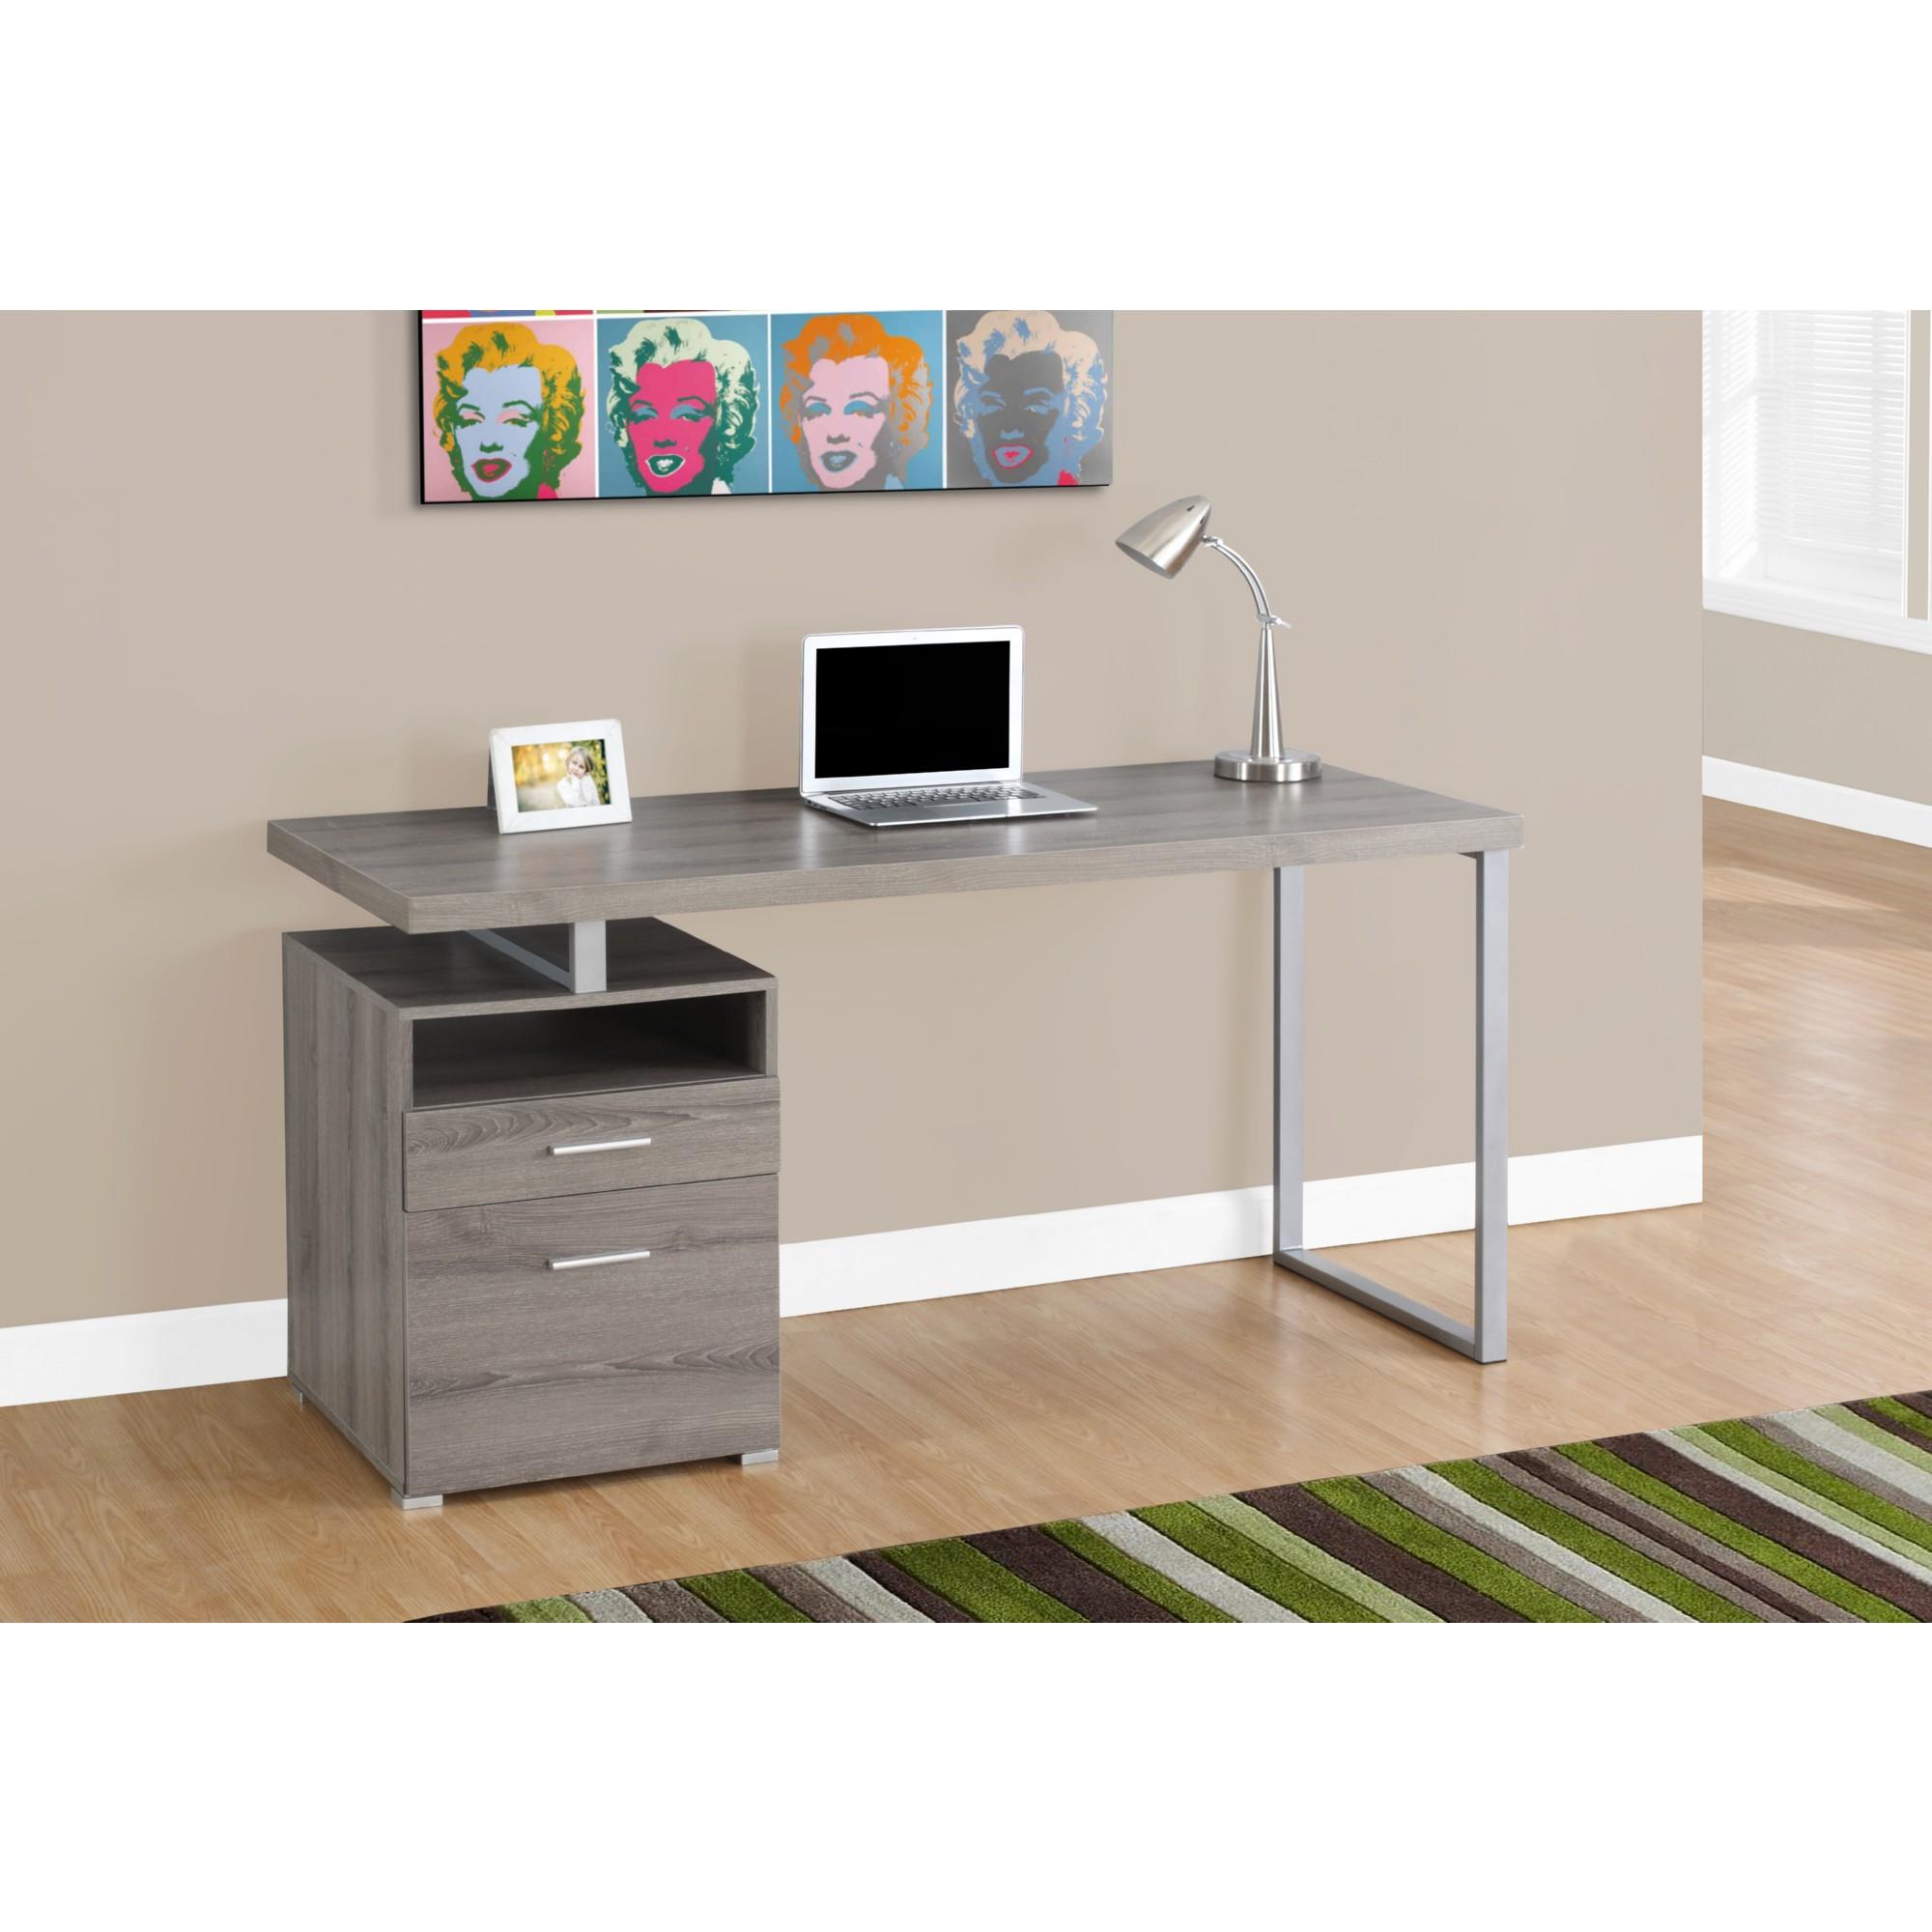 60 Computer Desk In Reclaimed Look Dark Taupe Silver Metal By Monarch Specialties